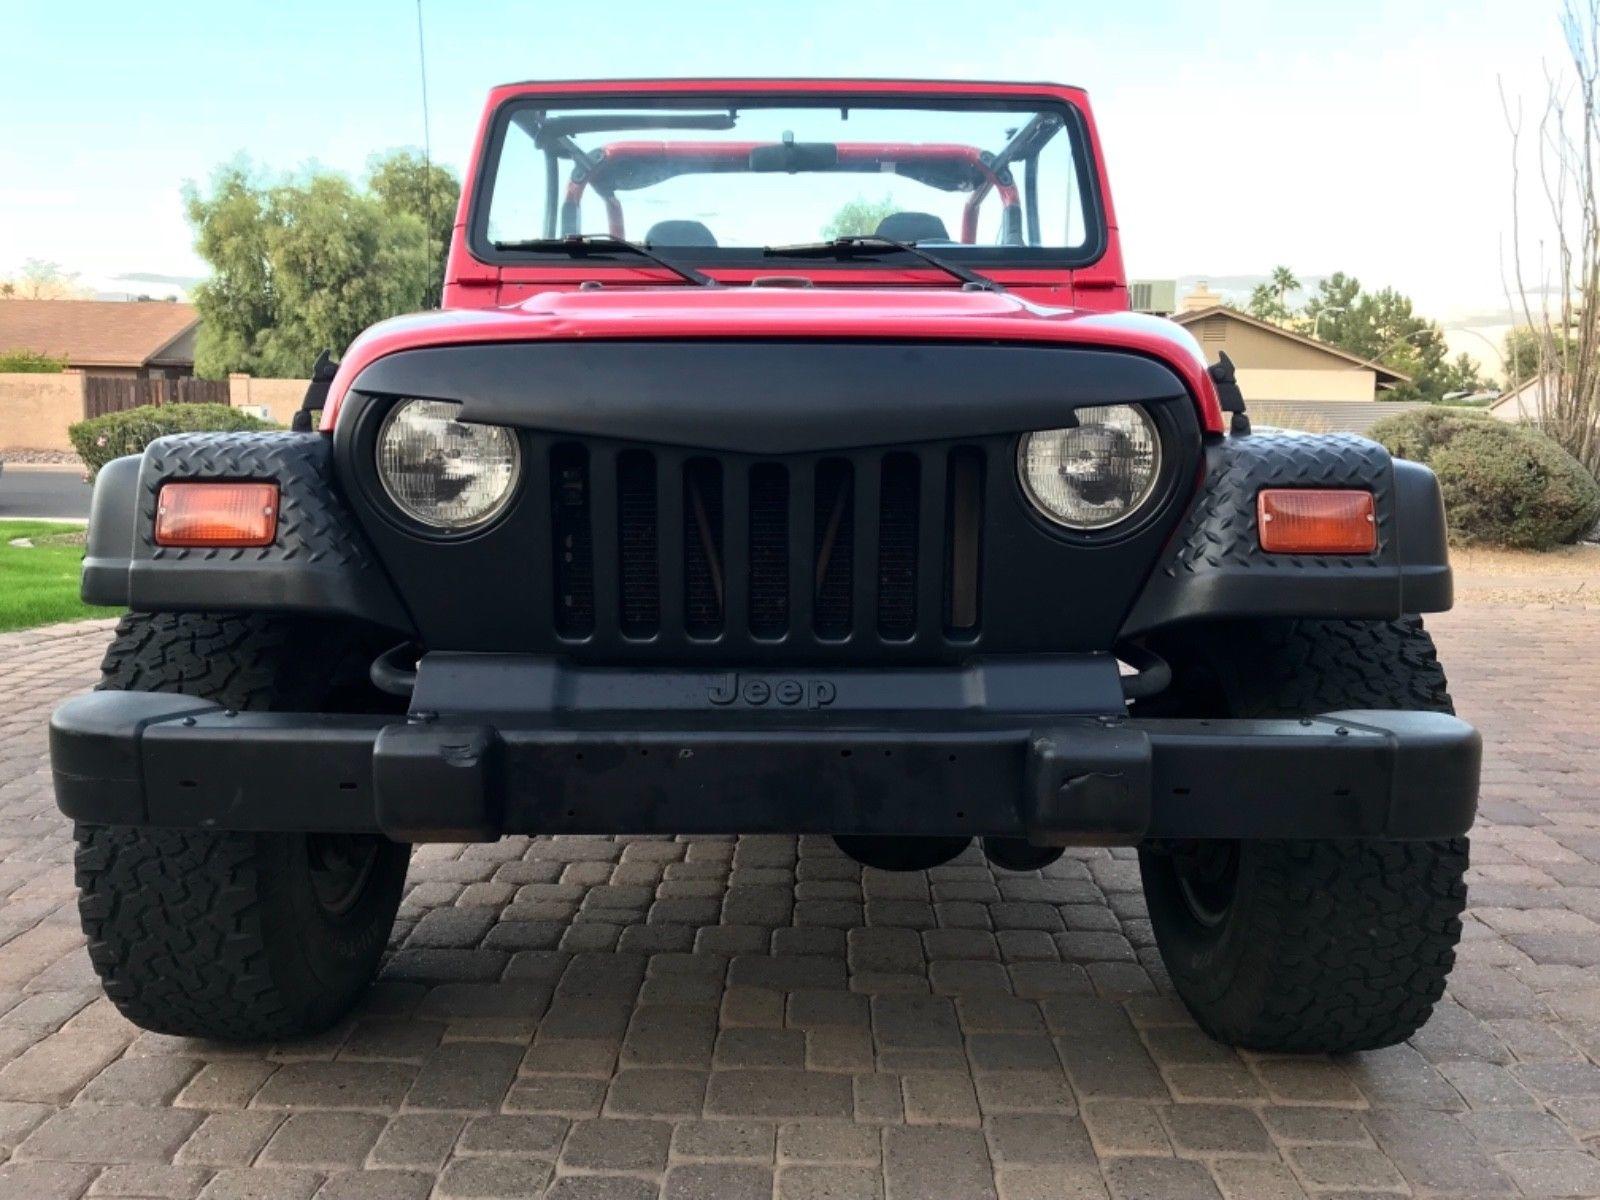 Amazing 1998 Jeep Wrangler Sport Sport Utility 2 Door 1998 Jeep Wrangler  Sport 4.0L 4X4 Soft Top Auto Clean Title **No Reserve!!** 2017/2018